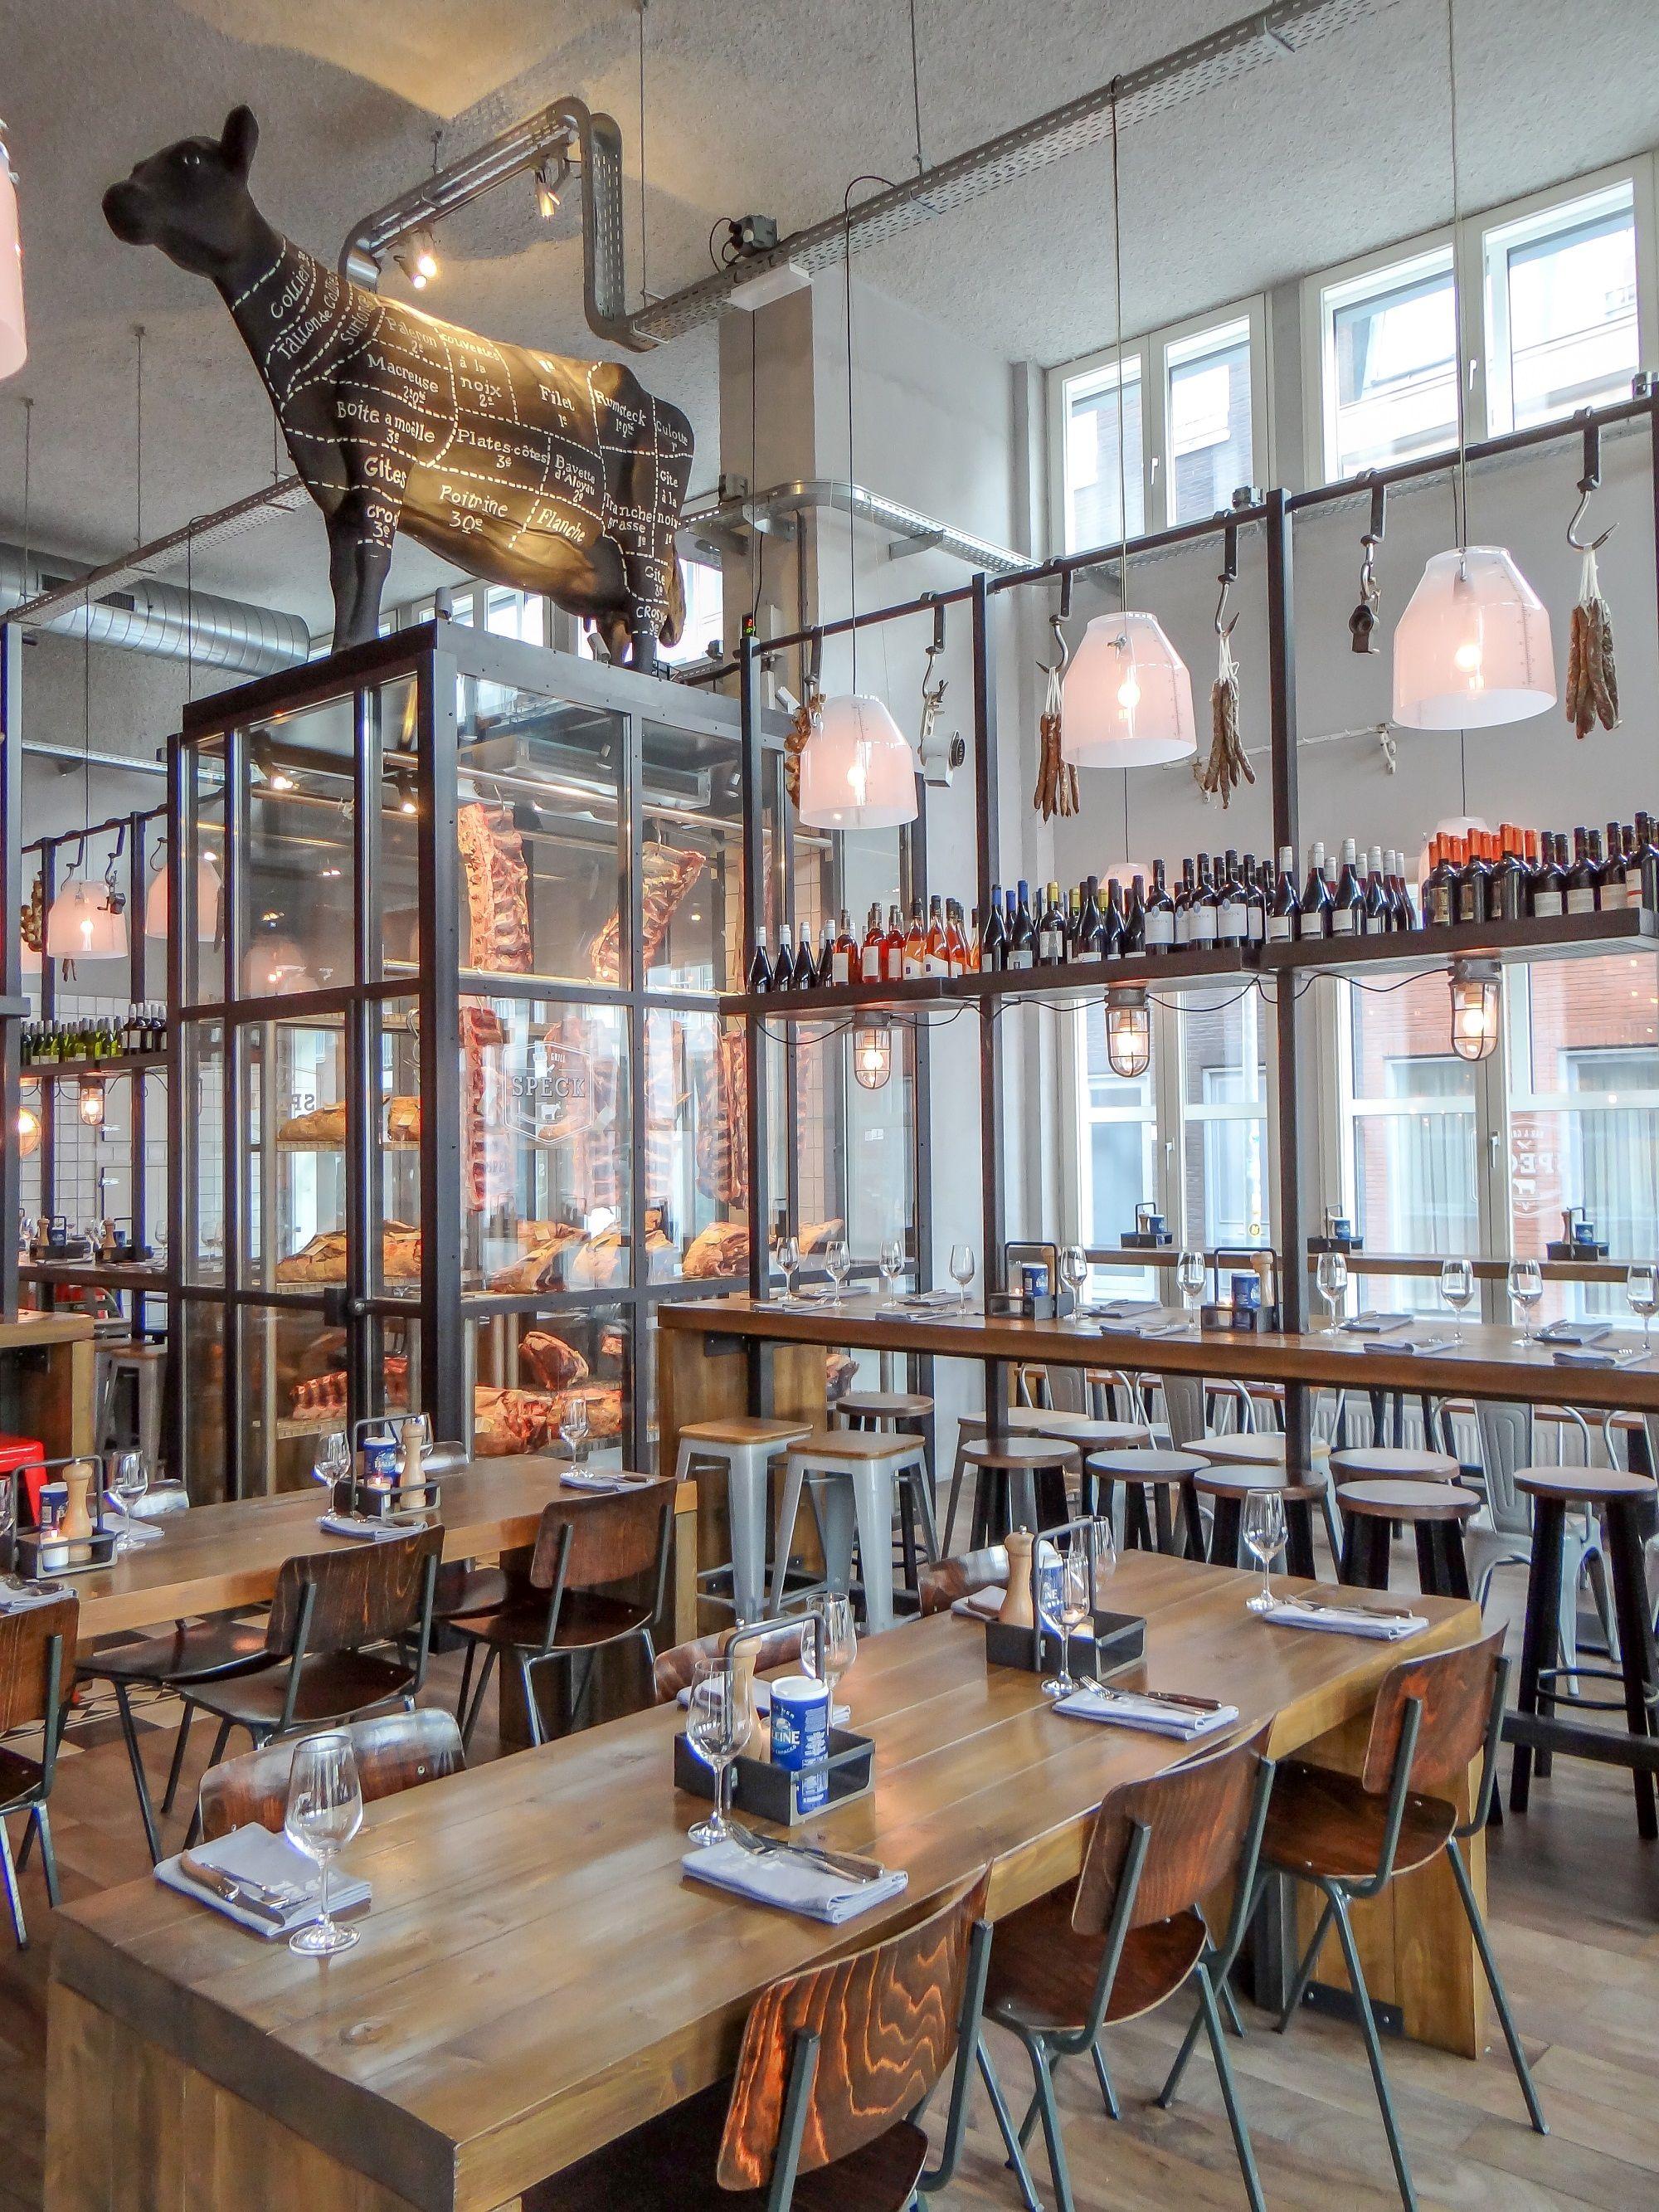 Restaurant Friesenstraße Köln